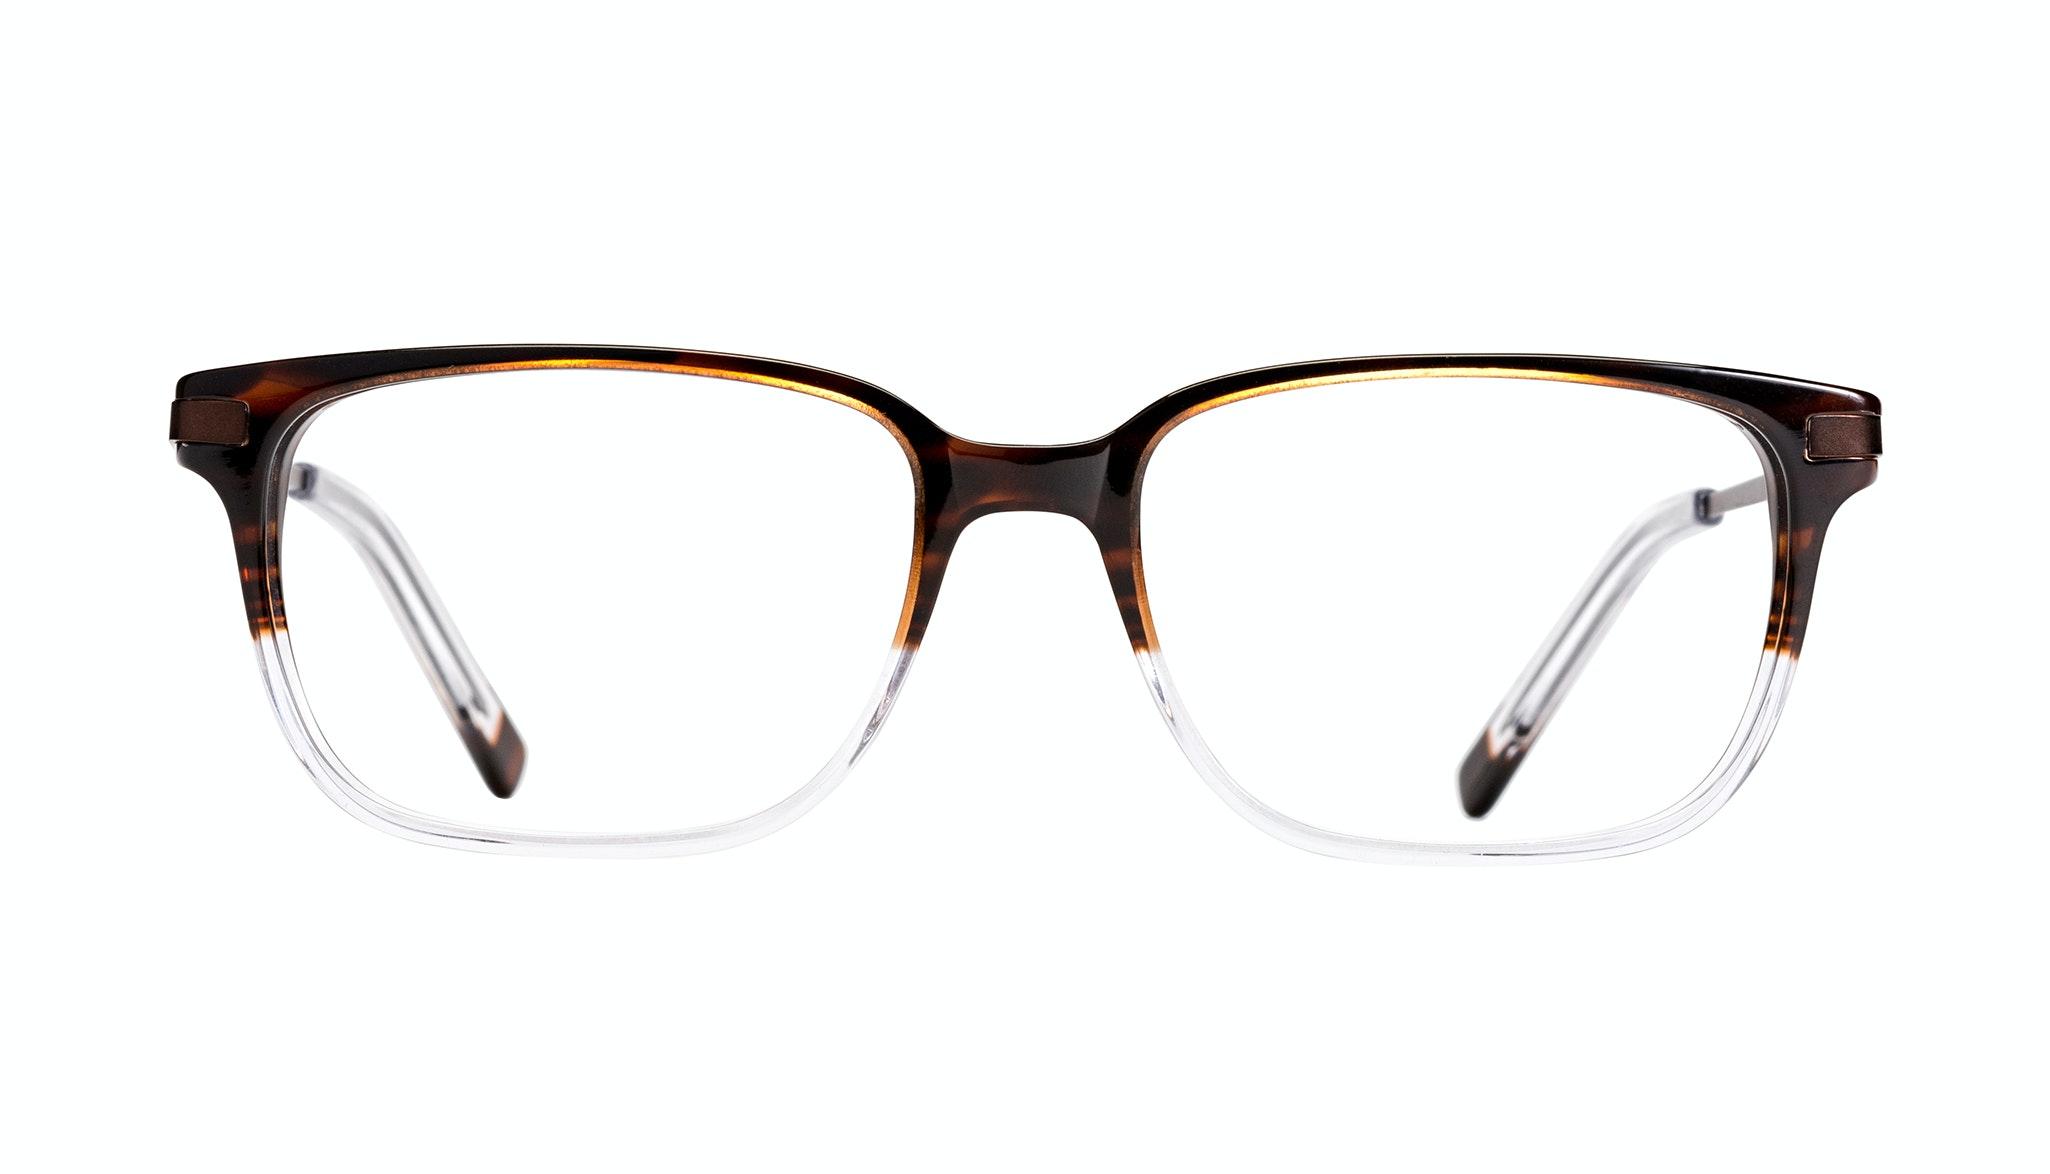 Affordable Fashion Glasses Rectangle Eyeglasses Men Trade Mud Clear